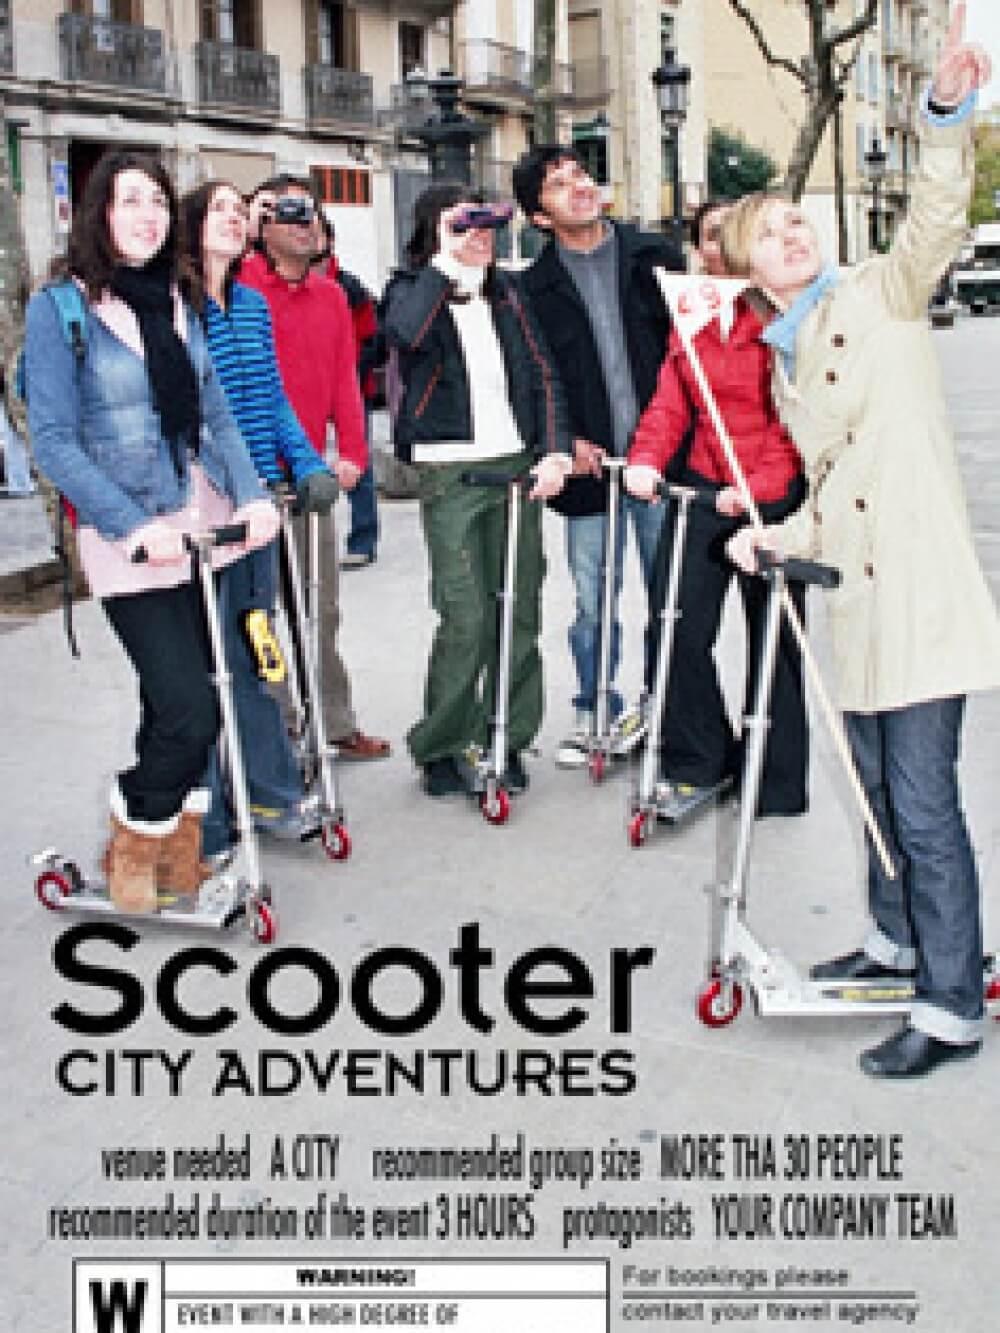 scooter_city_adventures_vertical_web